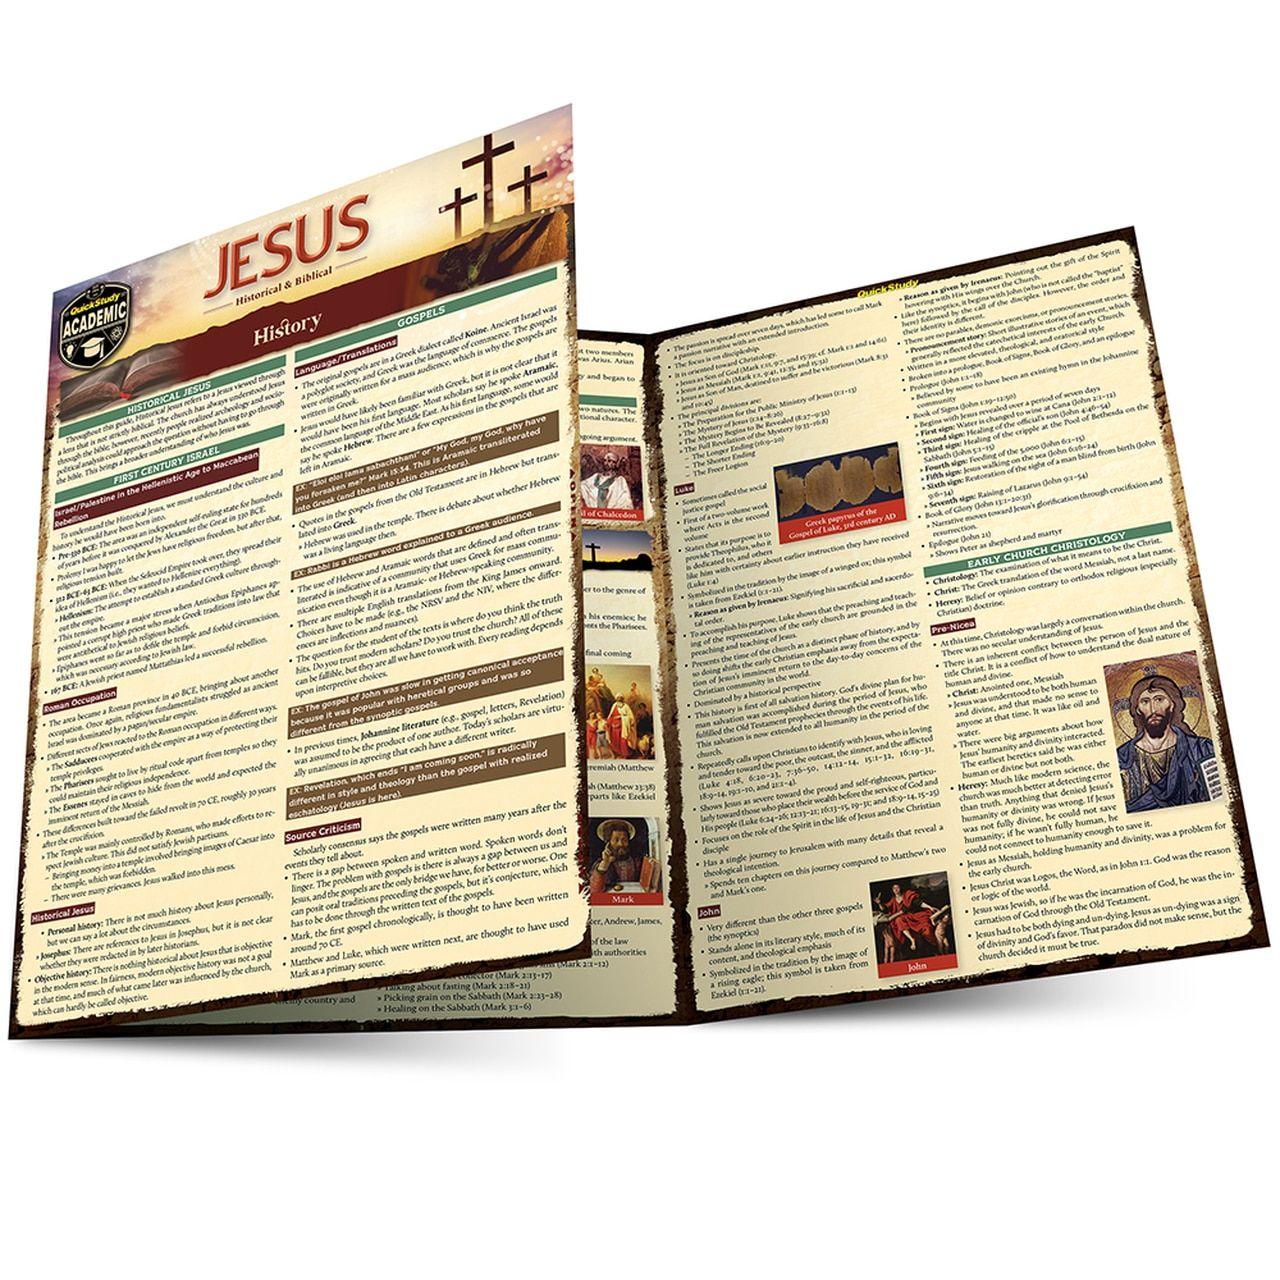 QuickStudy Jesus Historical & Biblical Laminated Study